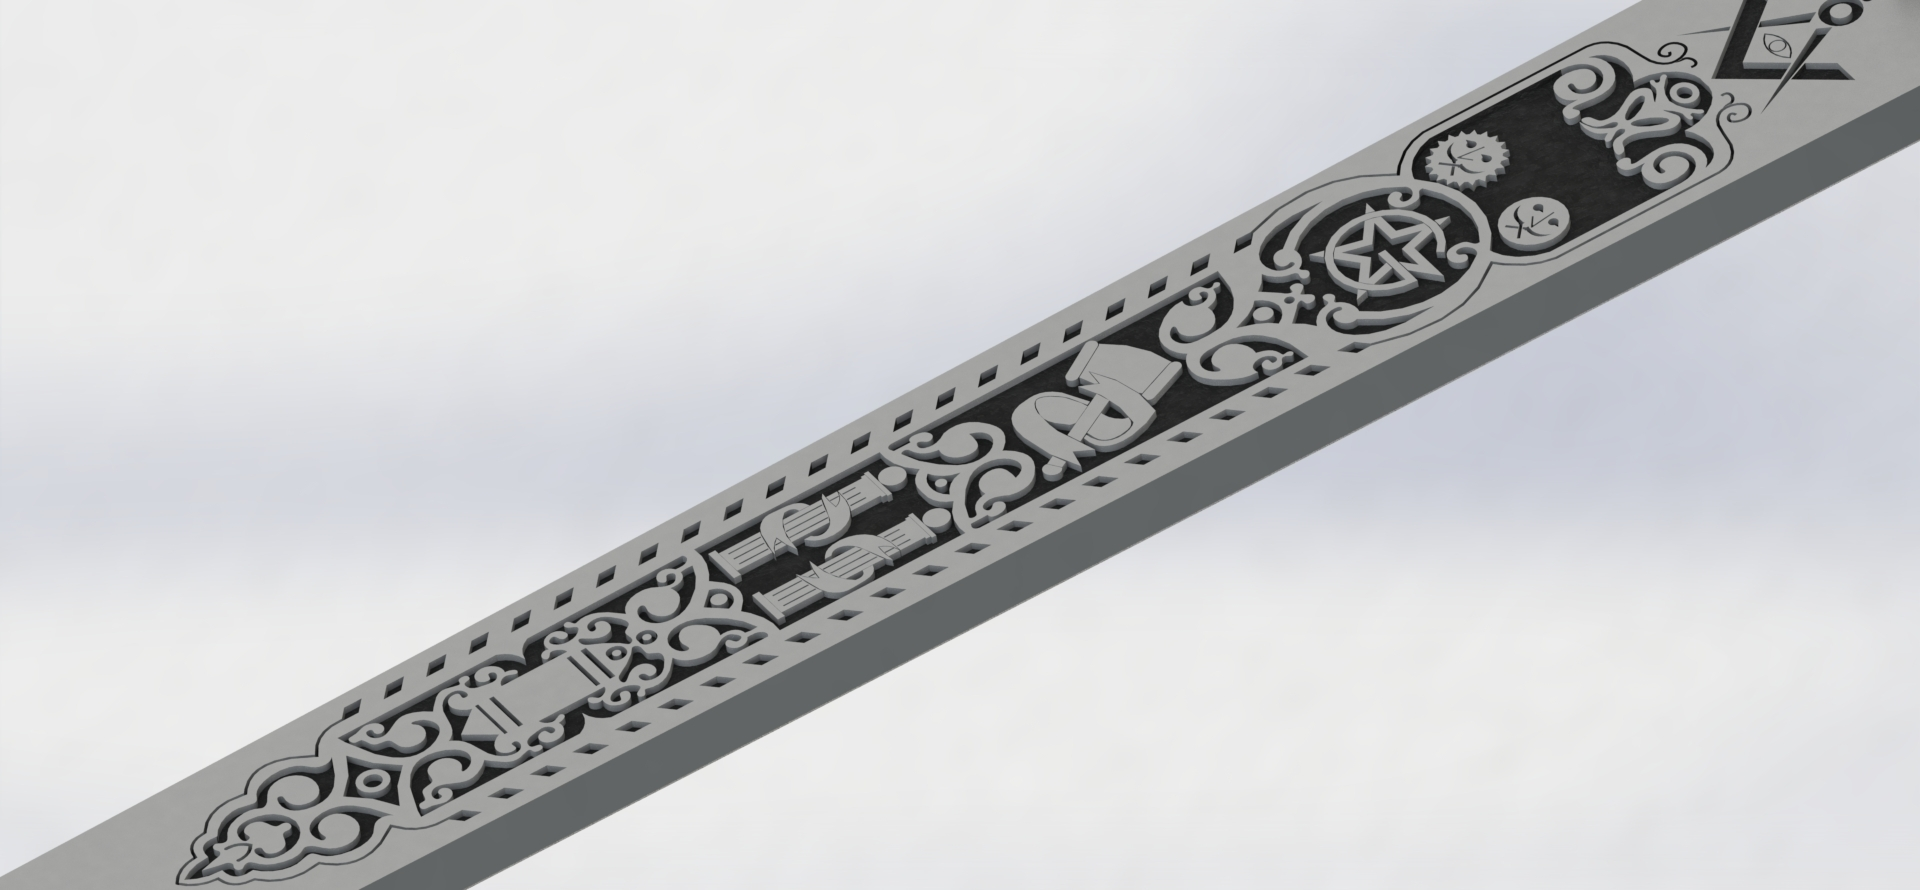 preview19.JPG Download STL file Masonic Ceremony Sword-Ready 3D Print • 3D printable template, GokBoru